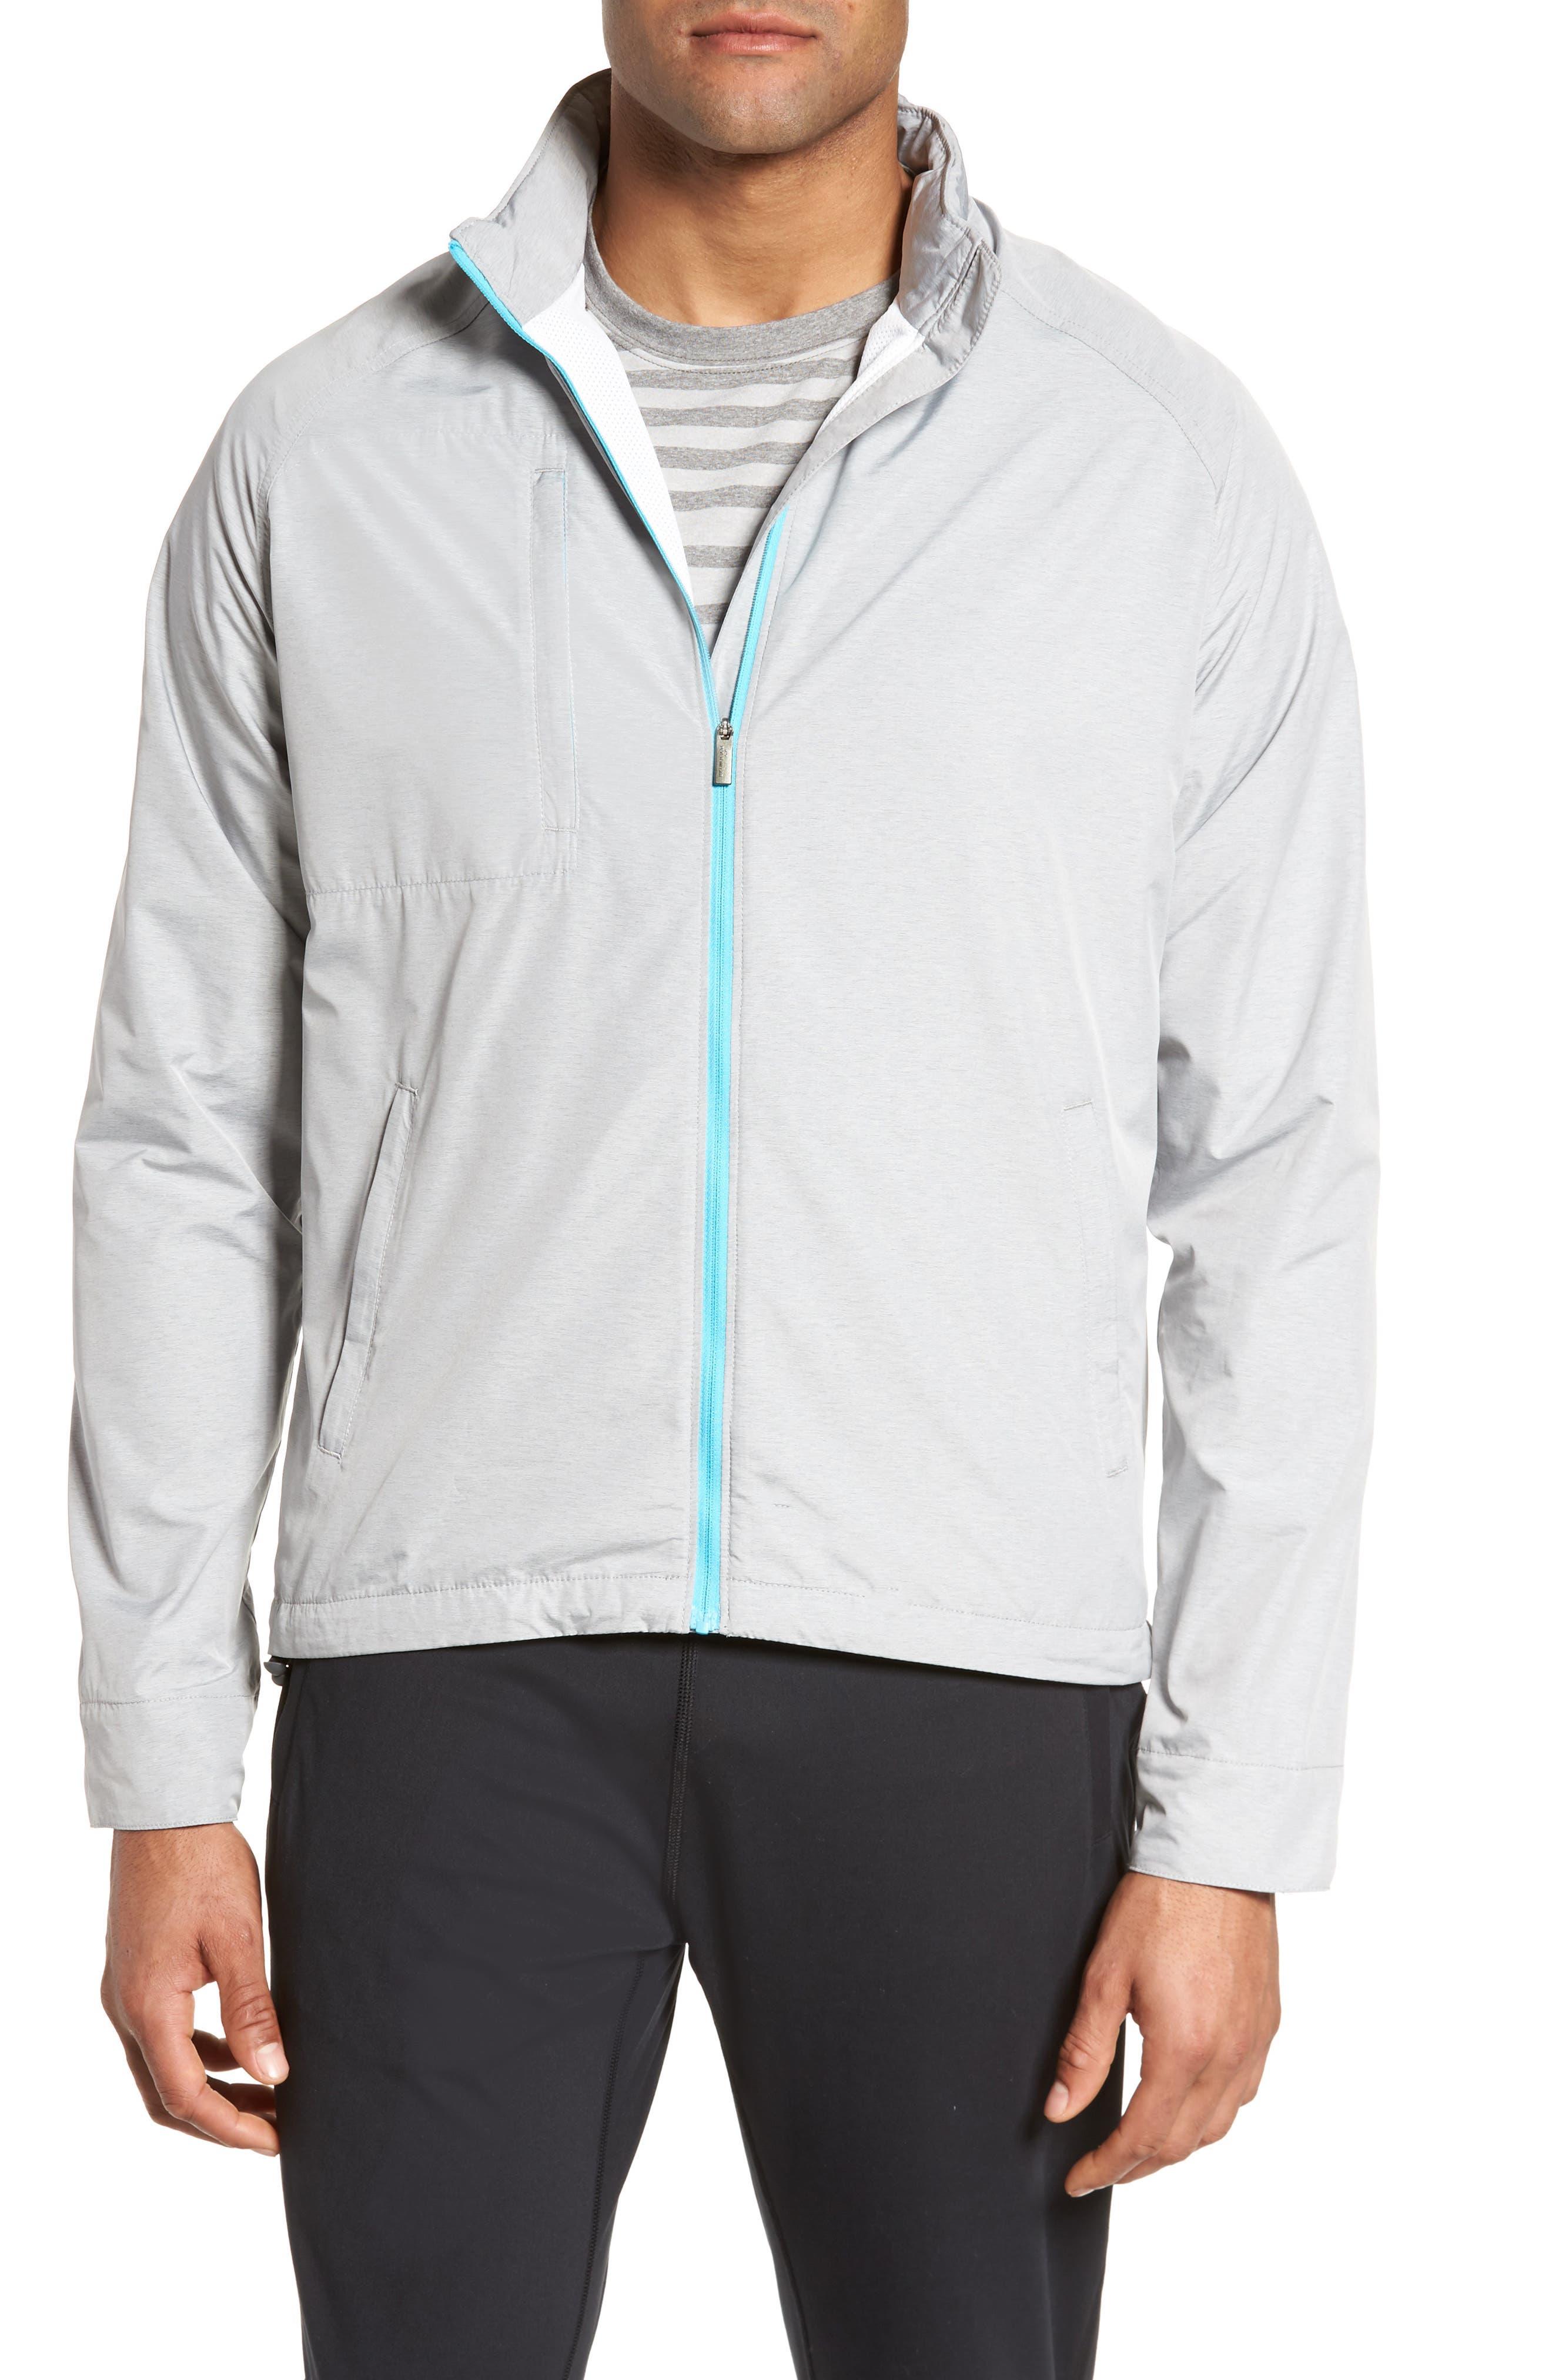 Peter Millar Nagano Windbreaker Jacket